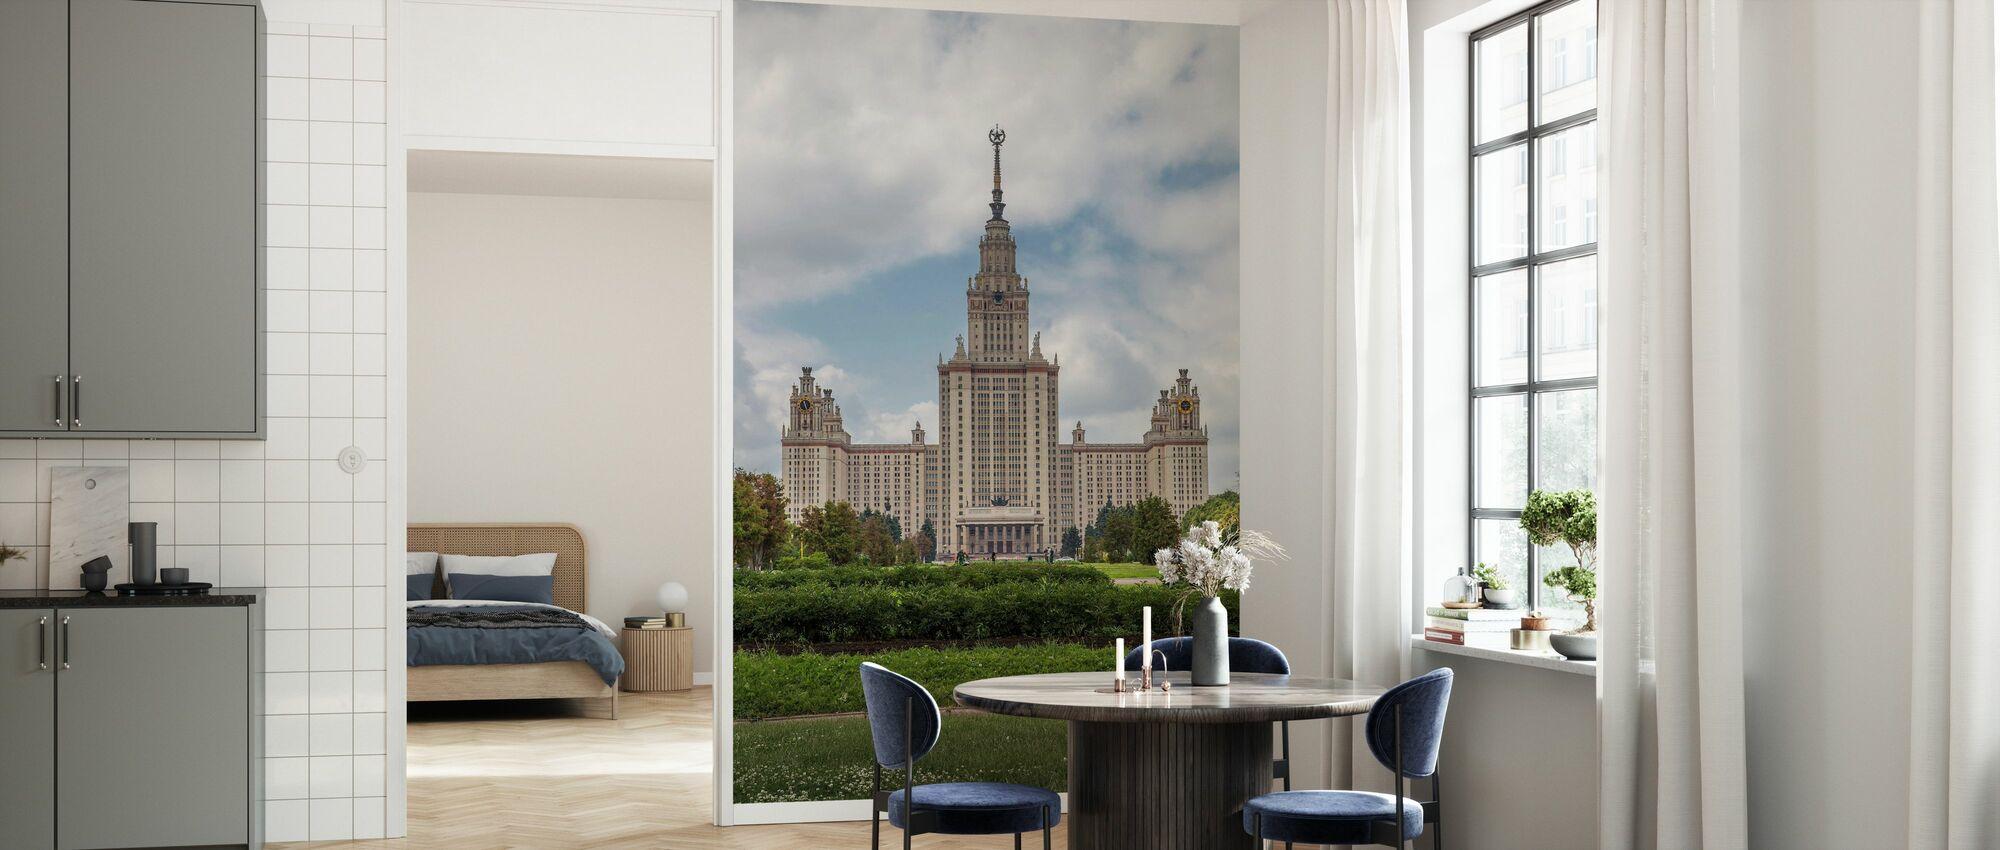 Lomonosov Moscow State University - Wallpaper - Kitchen